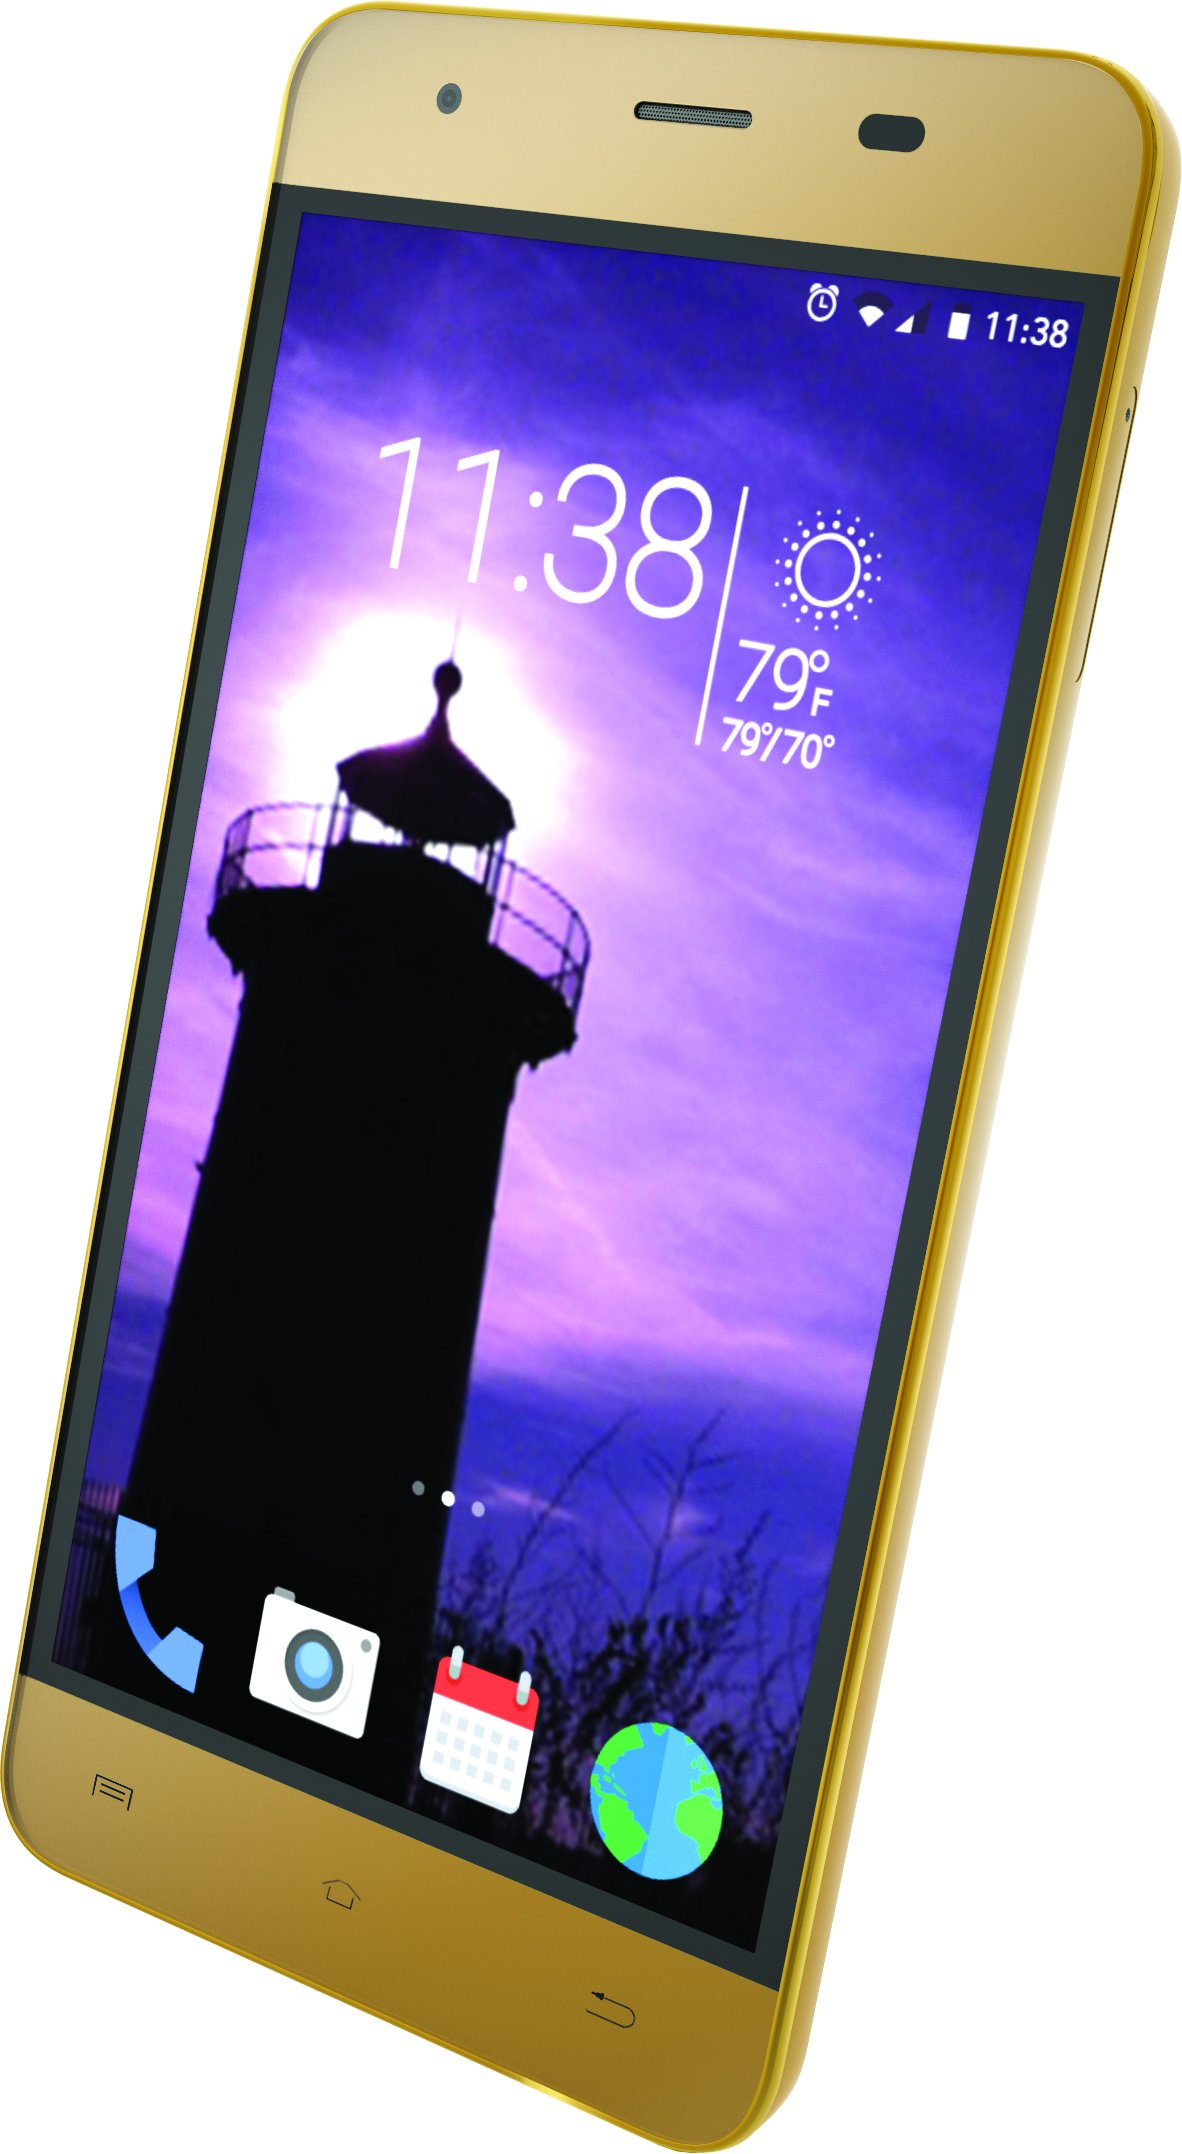 "Slide Unlocked Dual SIM Smartphone 5"" IPS Display 4G LTE GSM 13MP Camera Quad core 1.3GHz Processor, Gold"